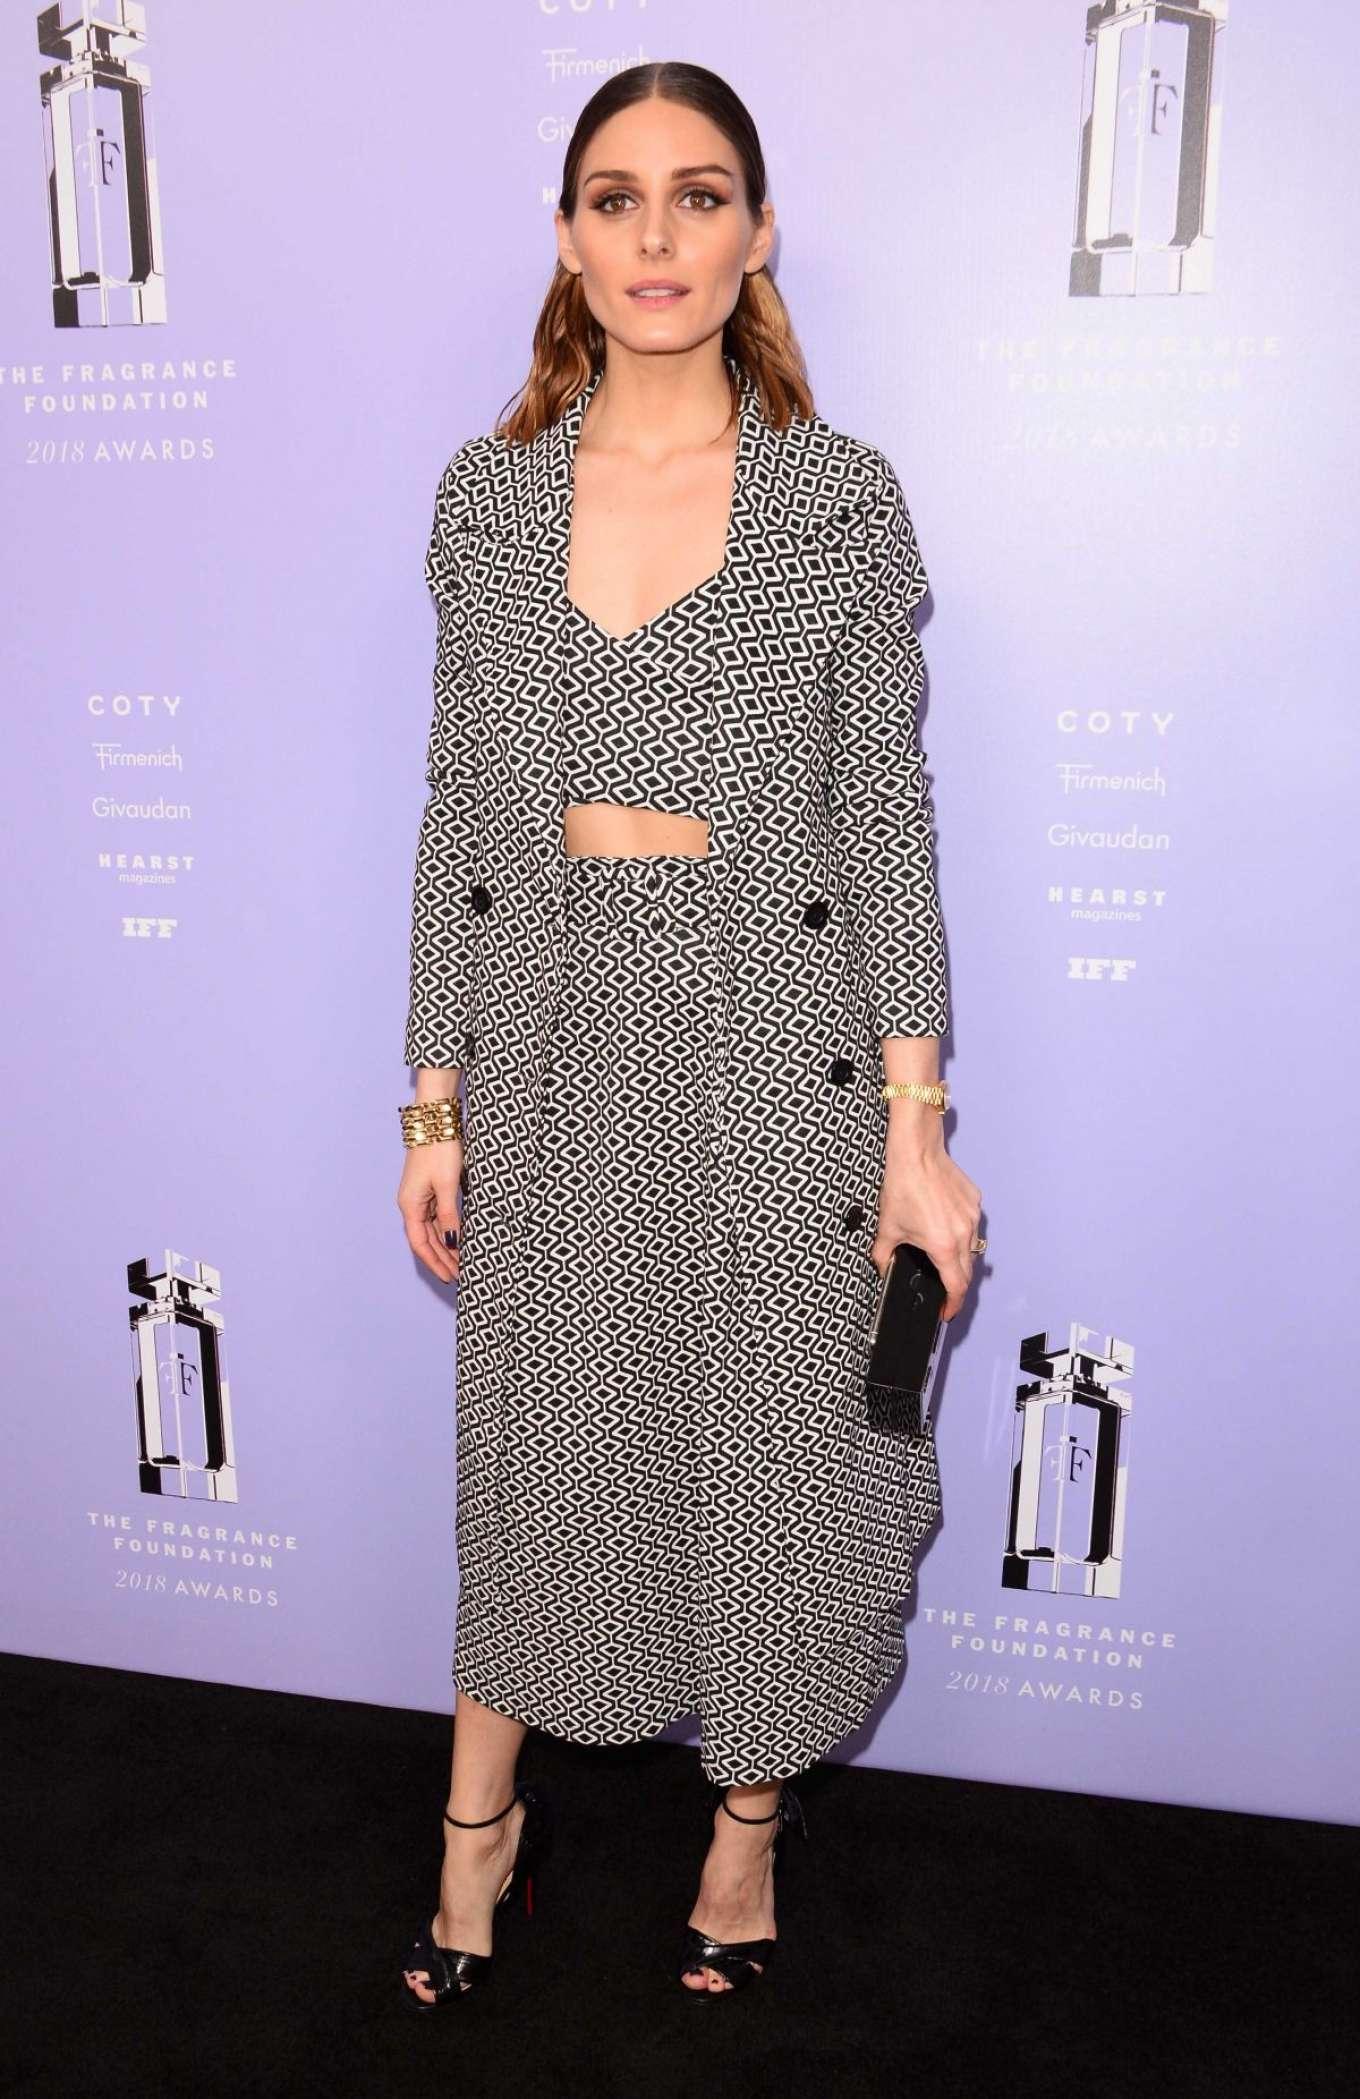 Olivia Palermo - 2018 Fragrance Foundation Awards in New York